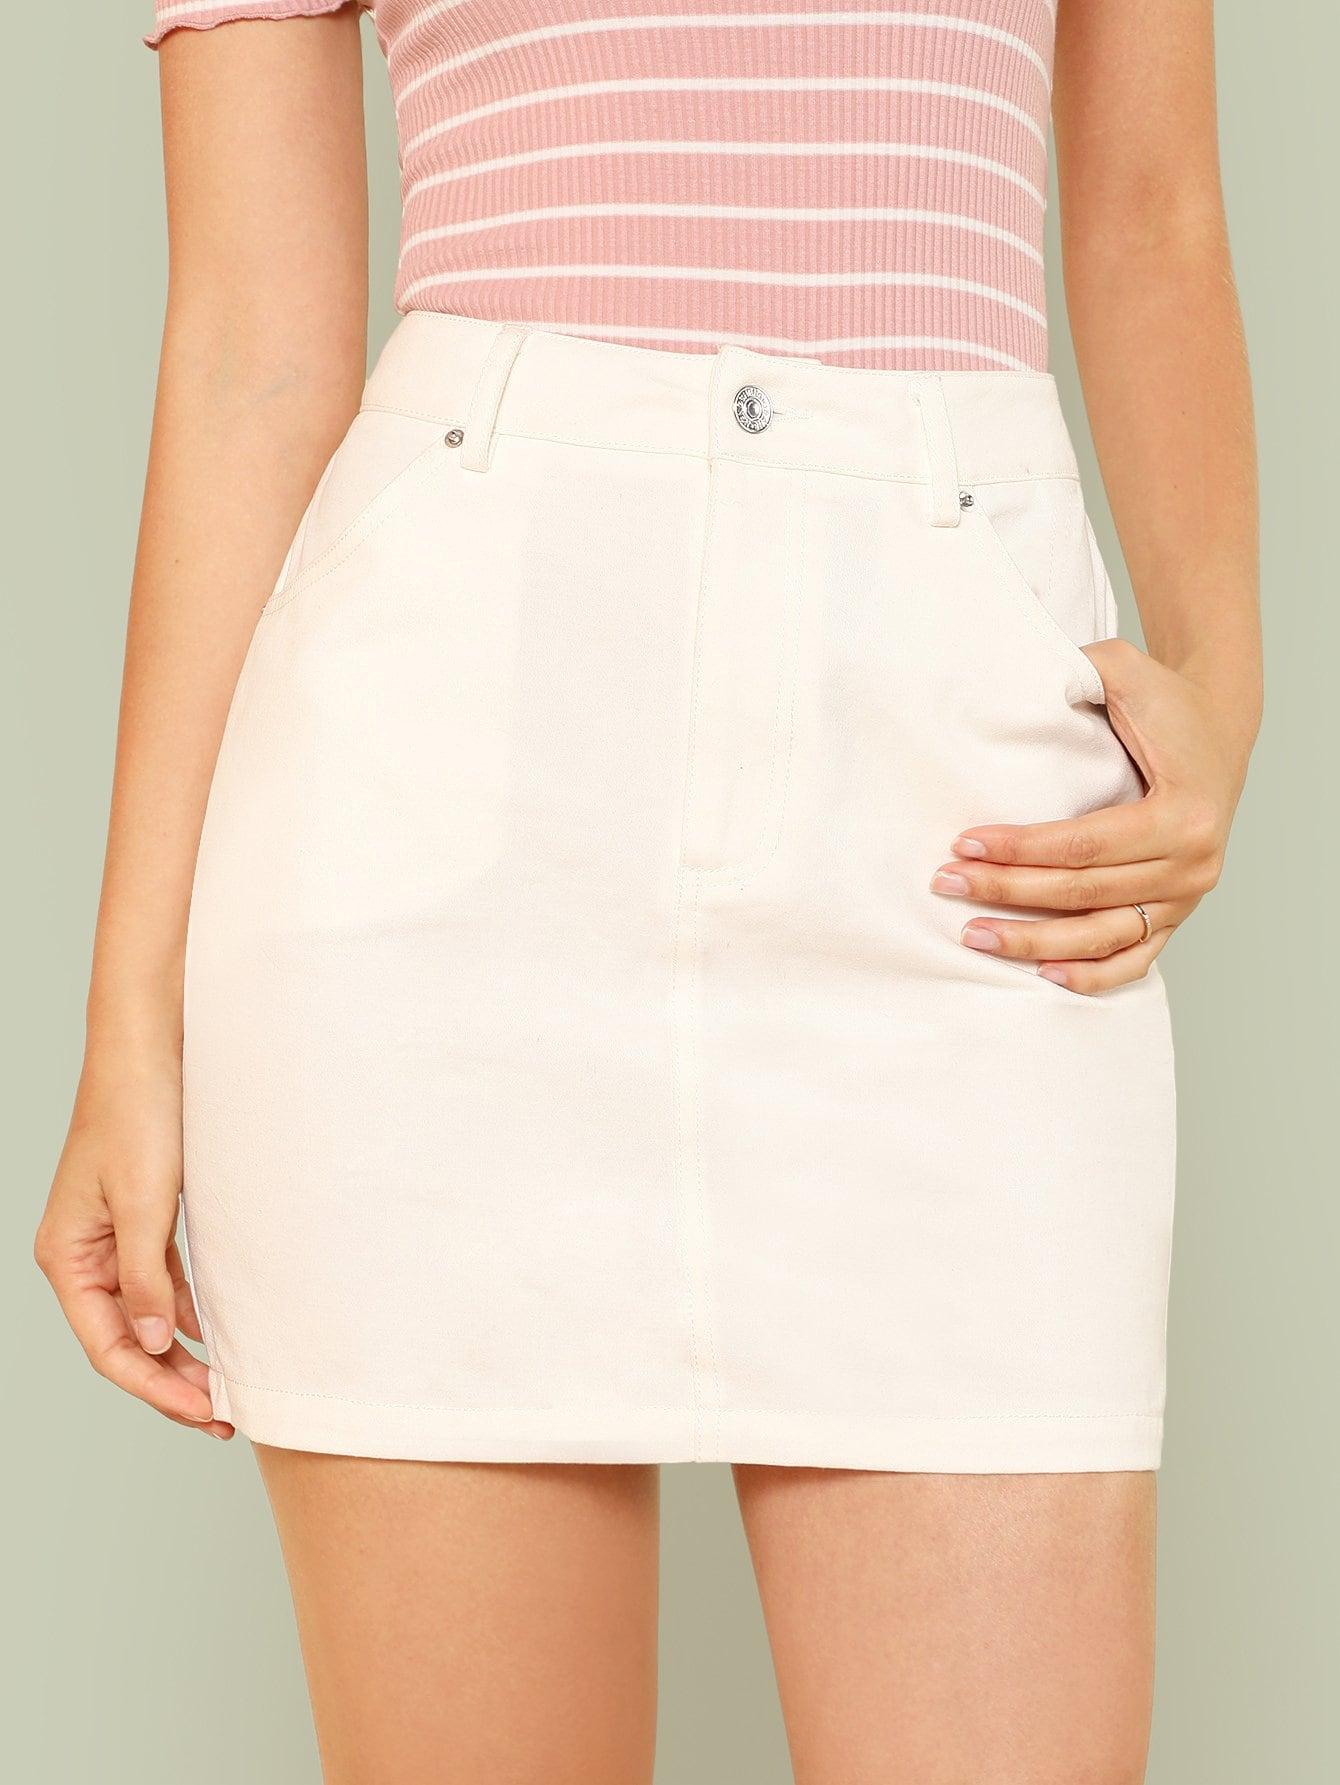 Pocket Patched Solid Skirt high waist pocket patched dot skirt